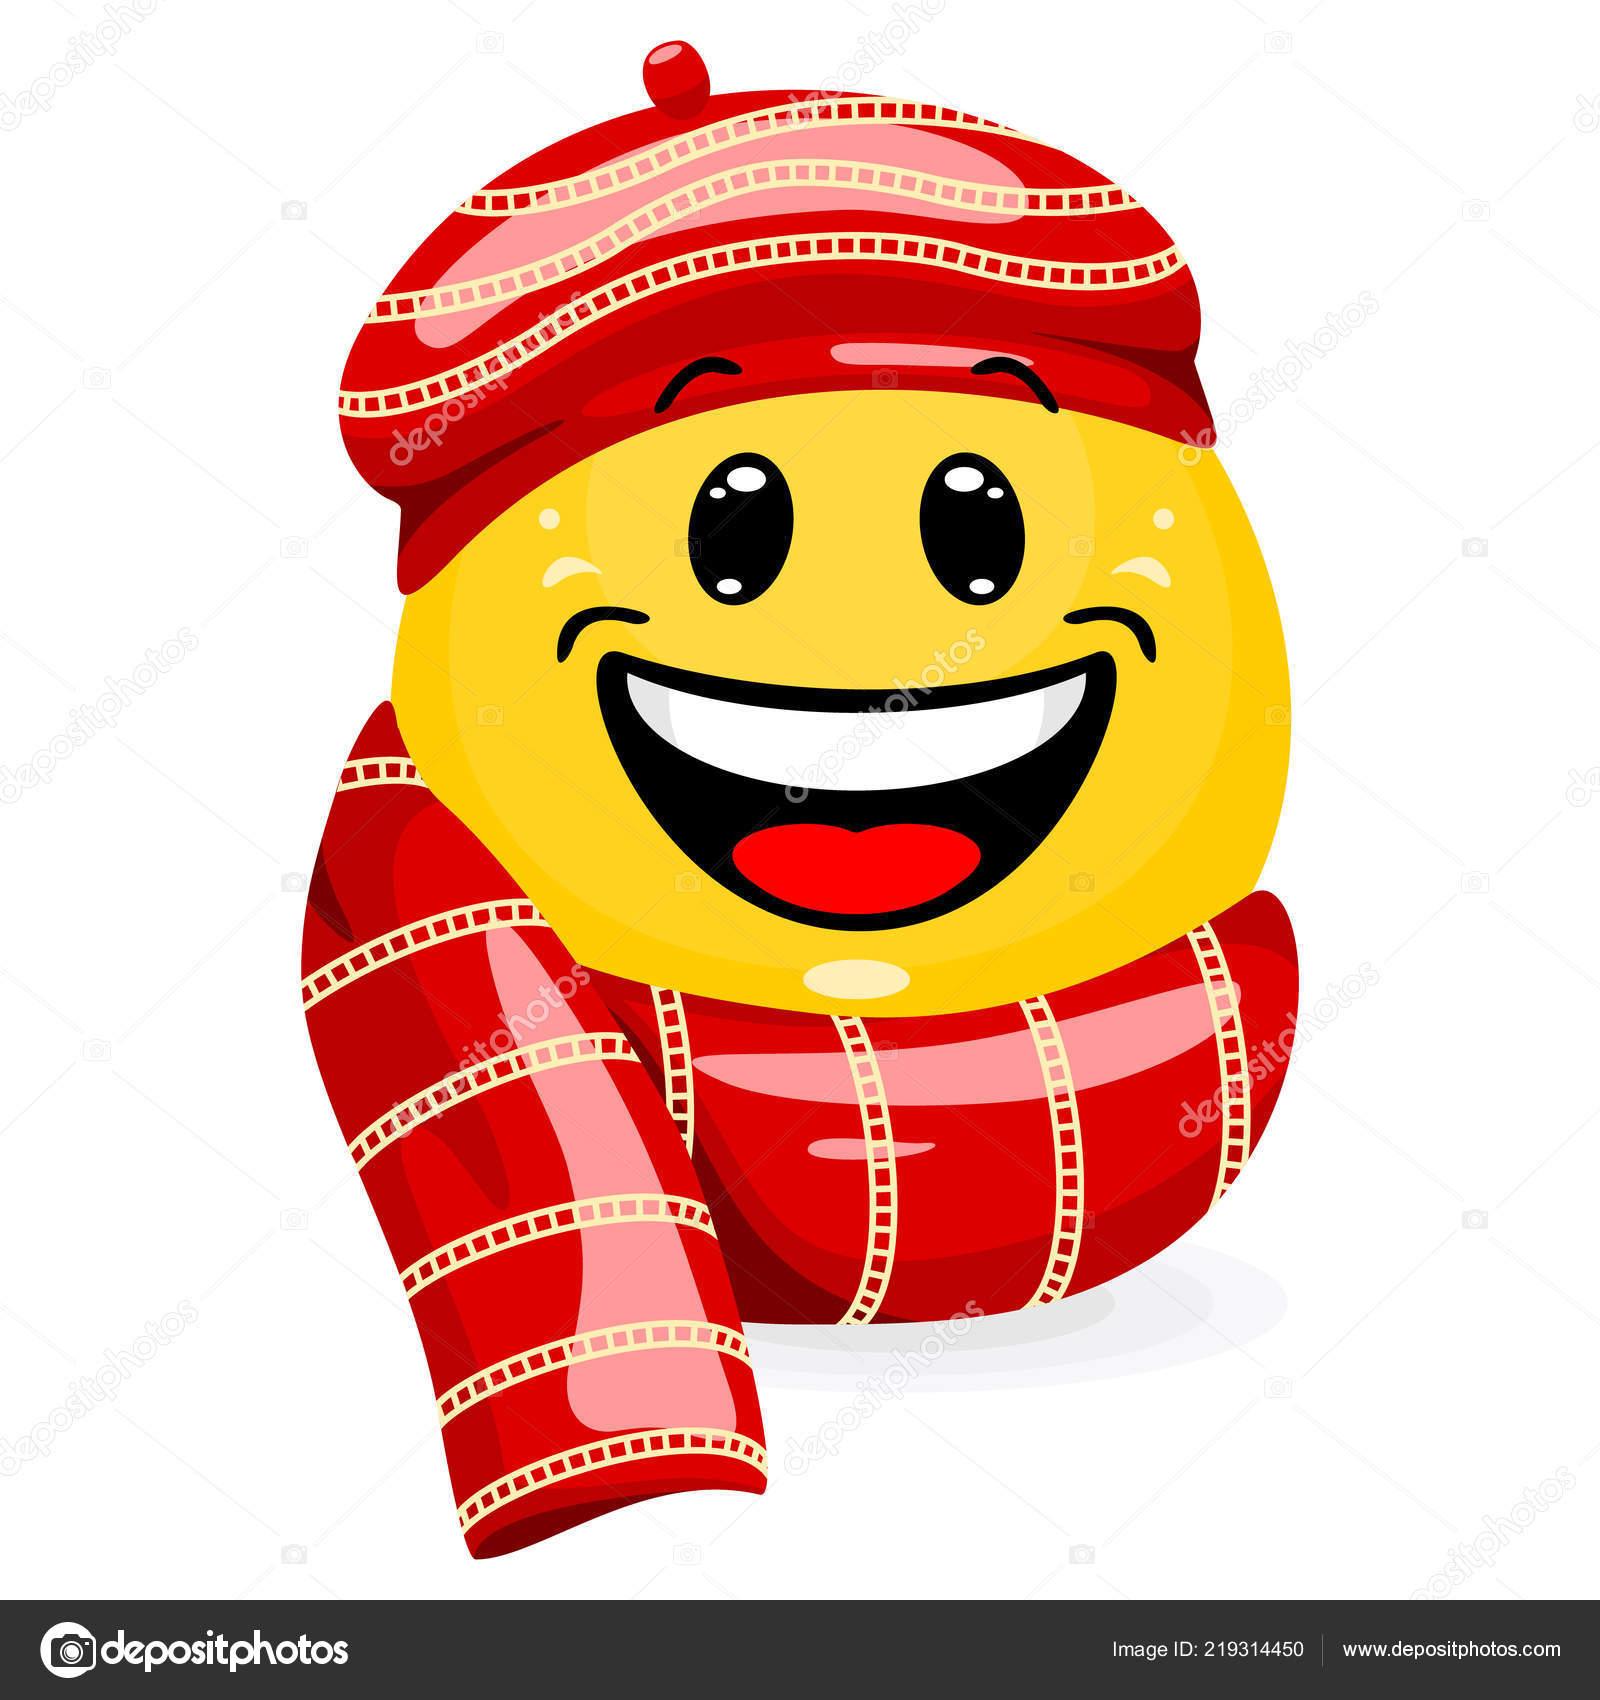 9de2fe9f61a1 Φατσούλα Φοράει Χειμωνιάτικα Ρούχα Χαμογελαστό Πρόσωπο Καπέλο Και Κασκόλ  Στυλ — Διανυσματικό Αρχείο